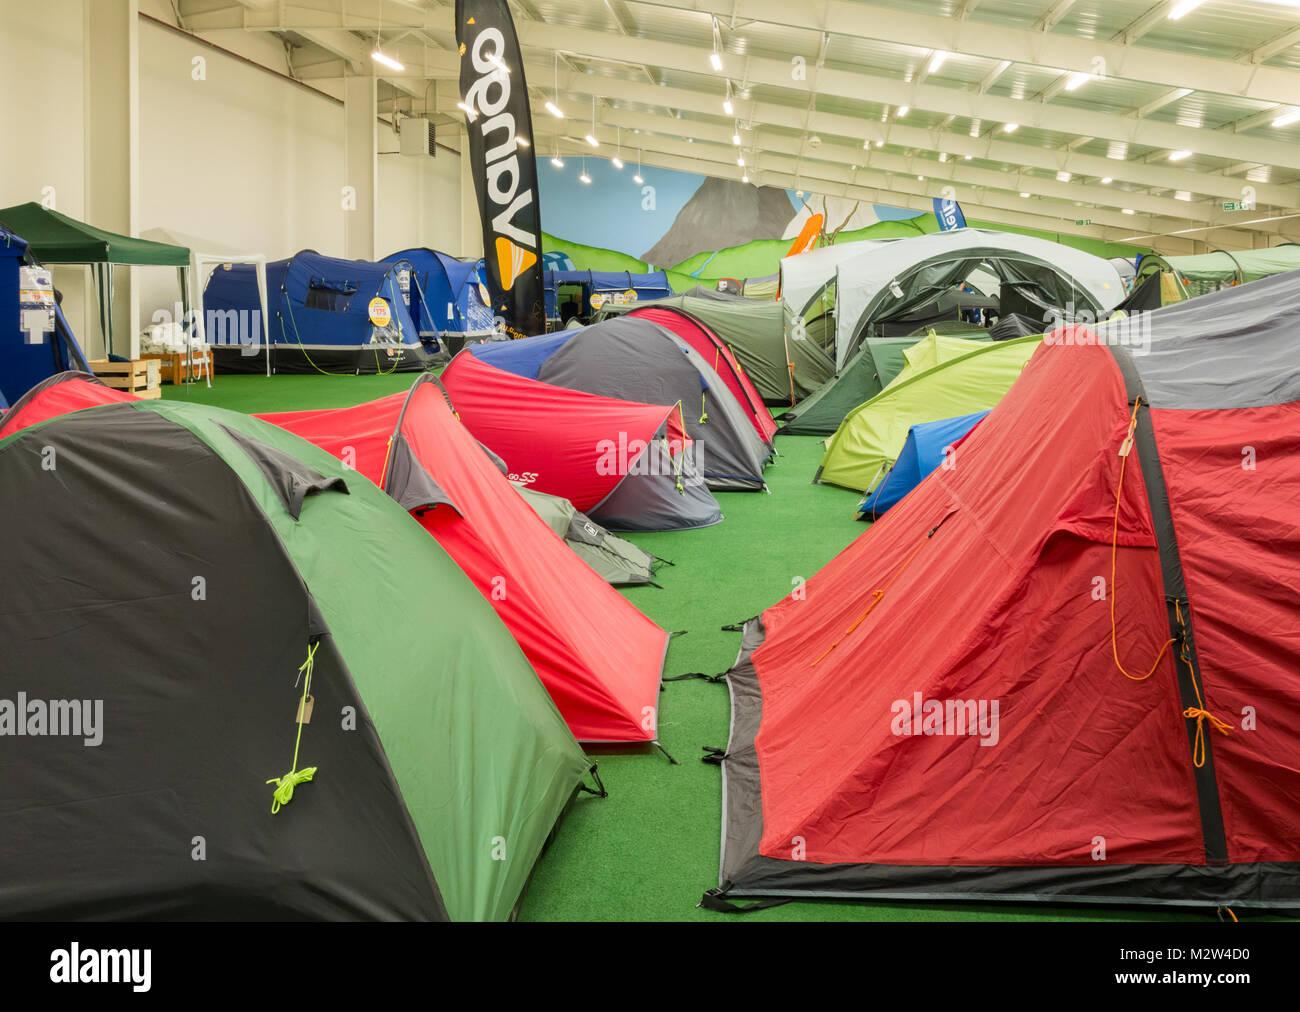 Tent display in Go outdoors store. UK & Tent display in Go outdoors store. UK Stock Photo Royalty Free ...